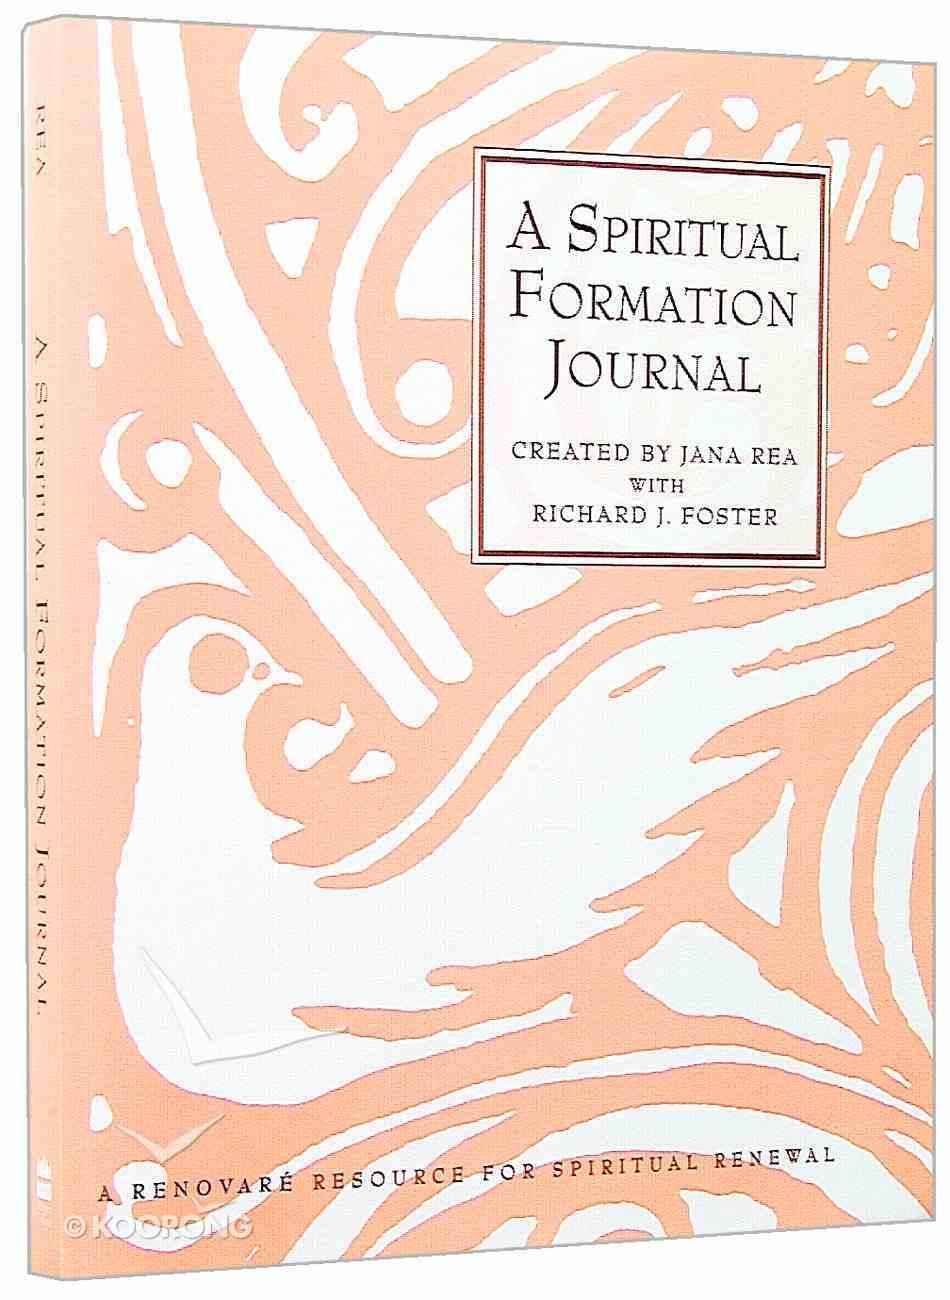 A Spiritual Formation Journal Paperback